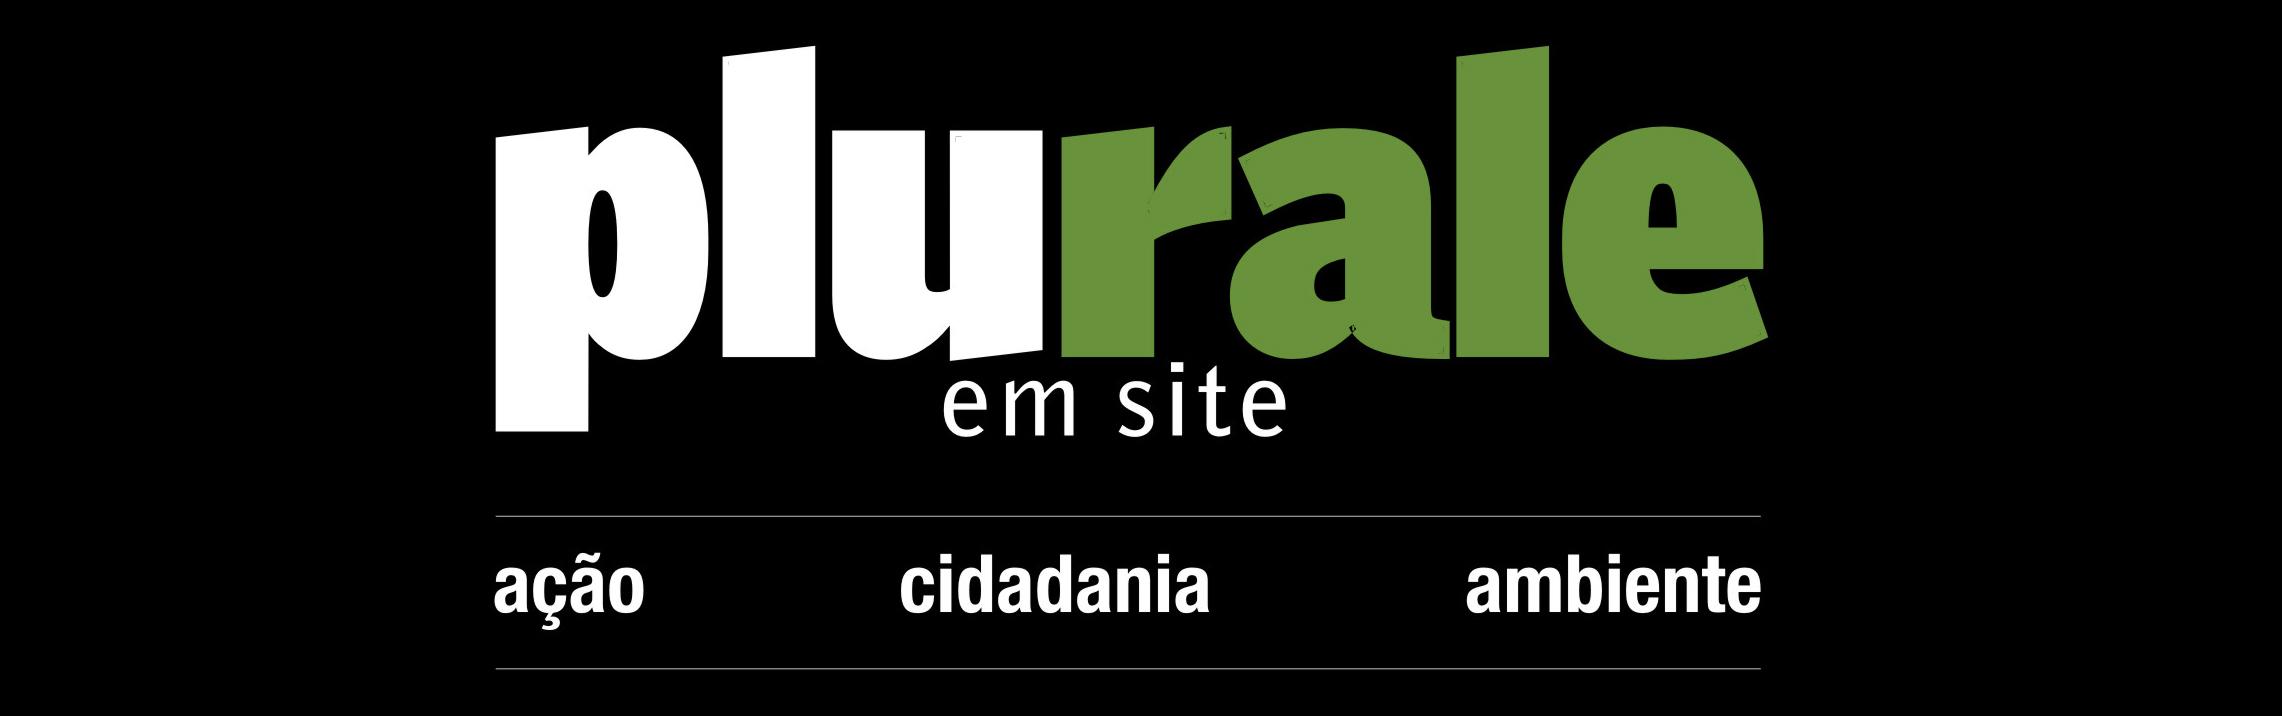 logomarca-plurale-em-site-no-preto